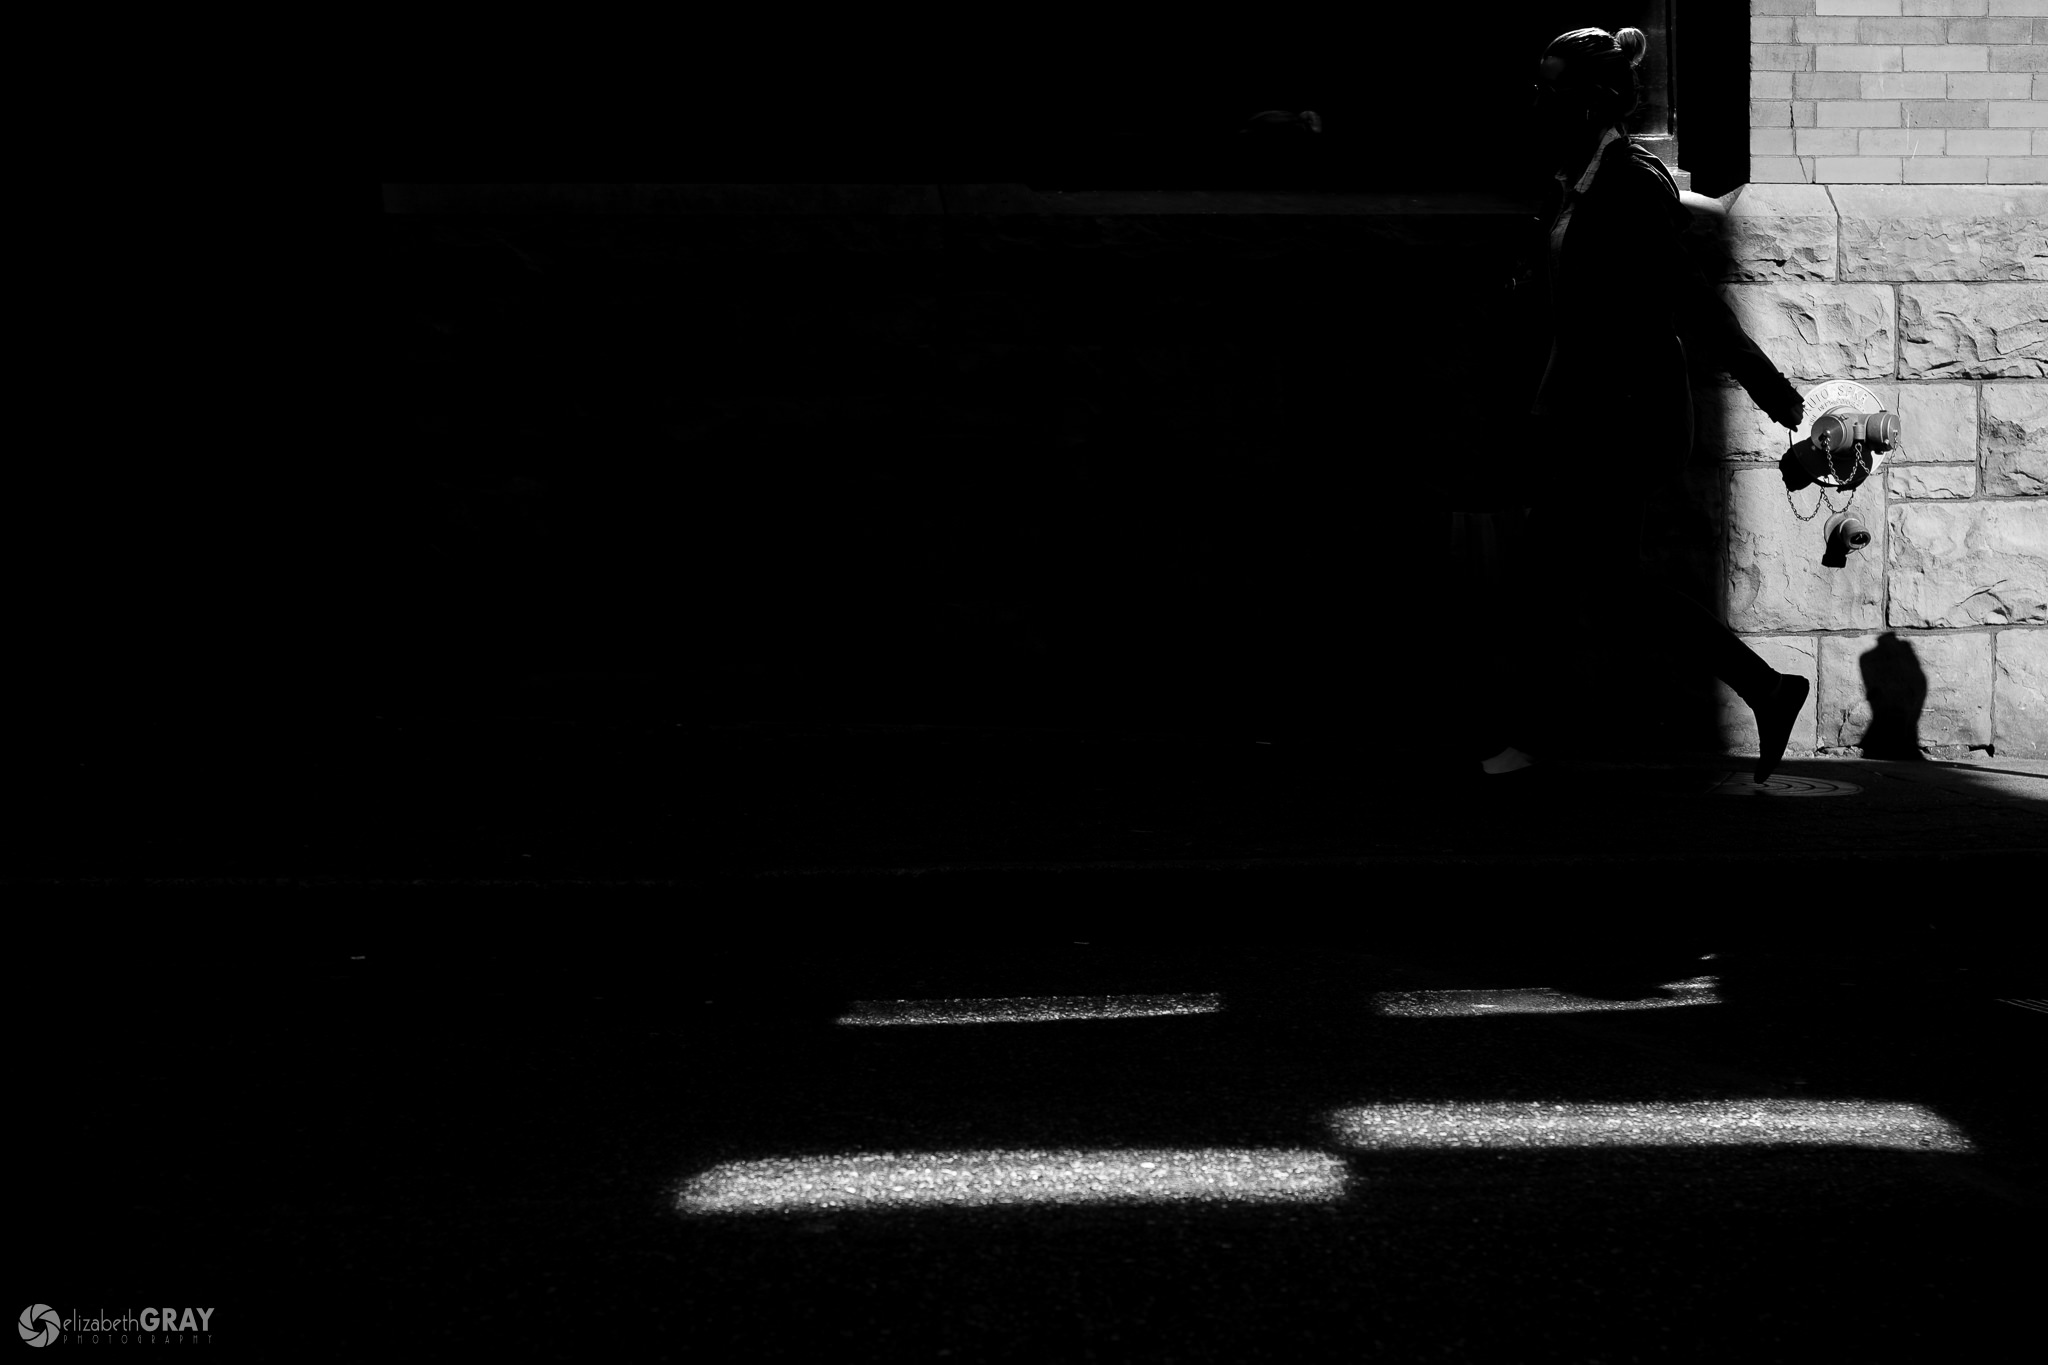 Back Lane Silhouette 2